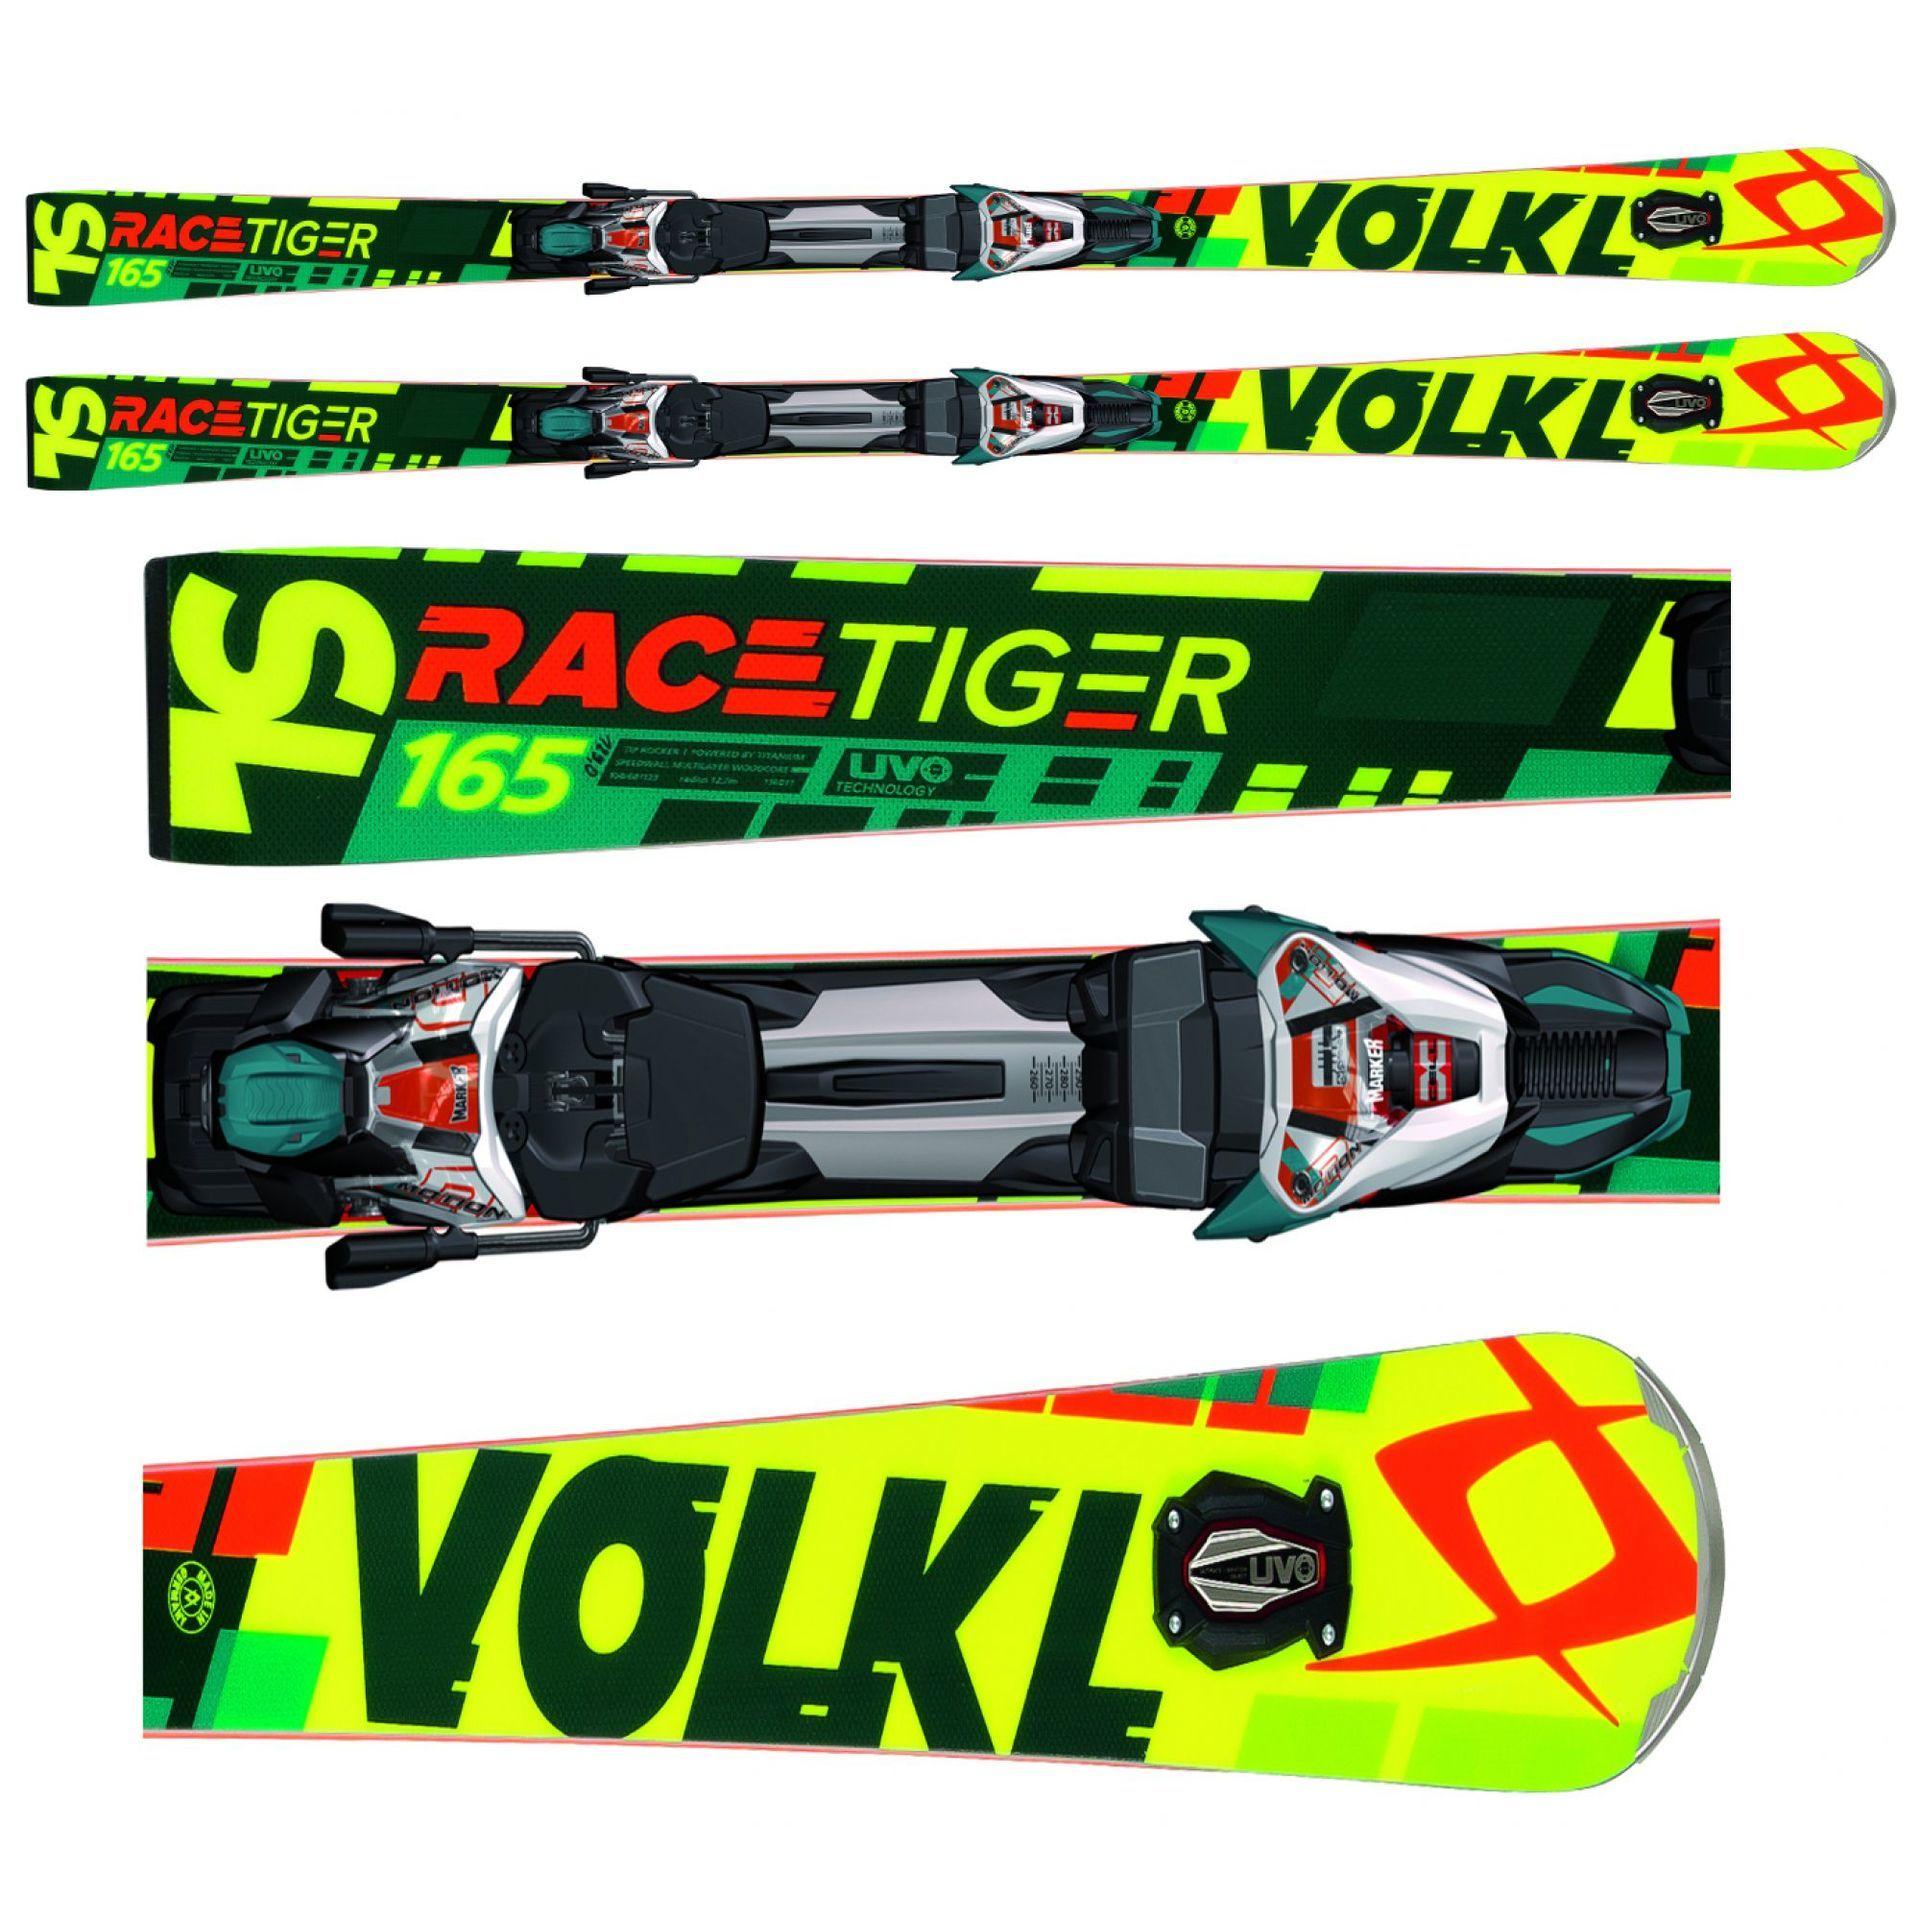 NARTY VOLKL RACETIGER SPEEDWALL SL UVO WIĄZANIA RMOTION 2 12.0 D RACE